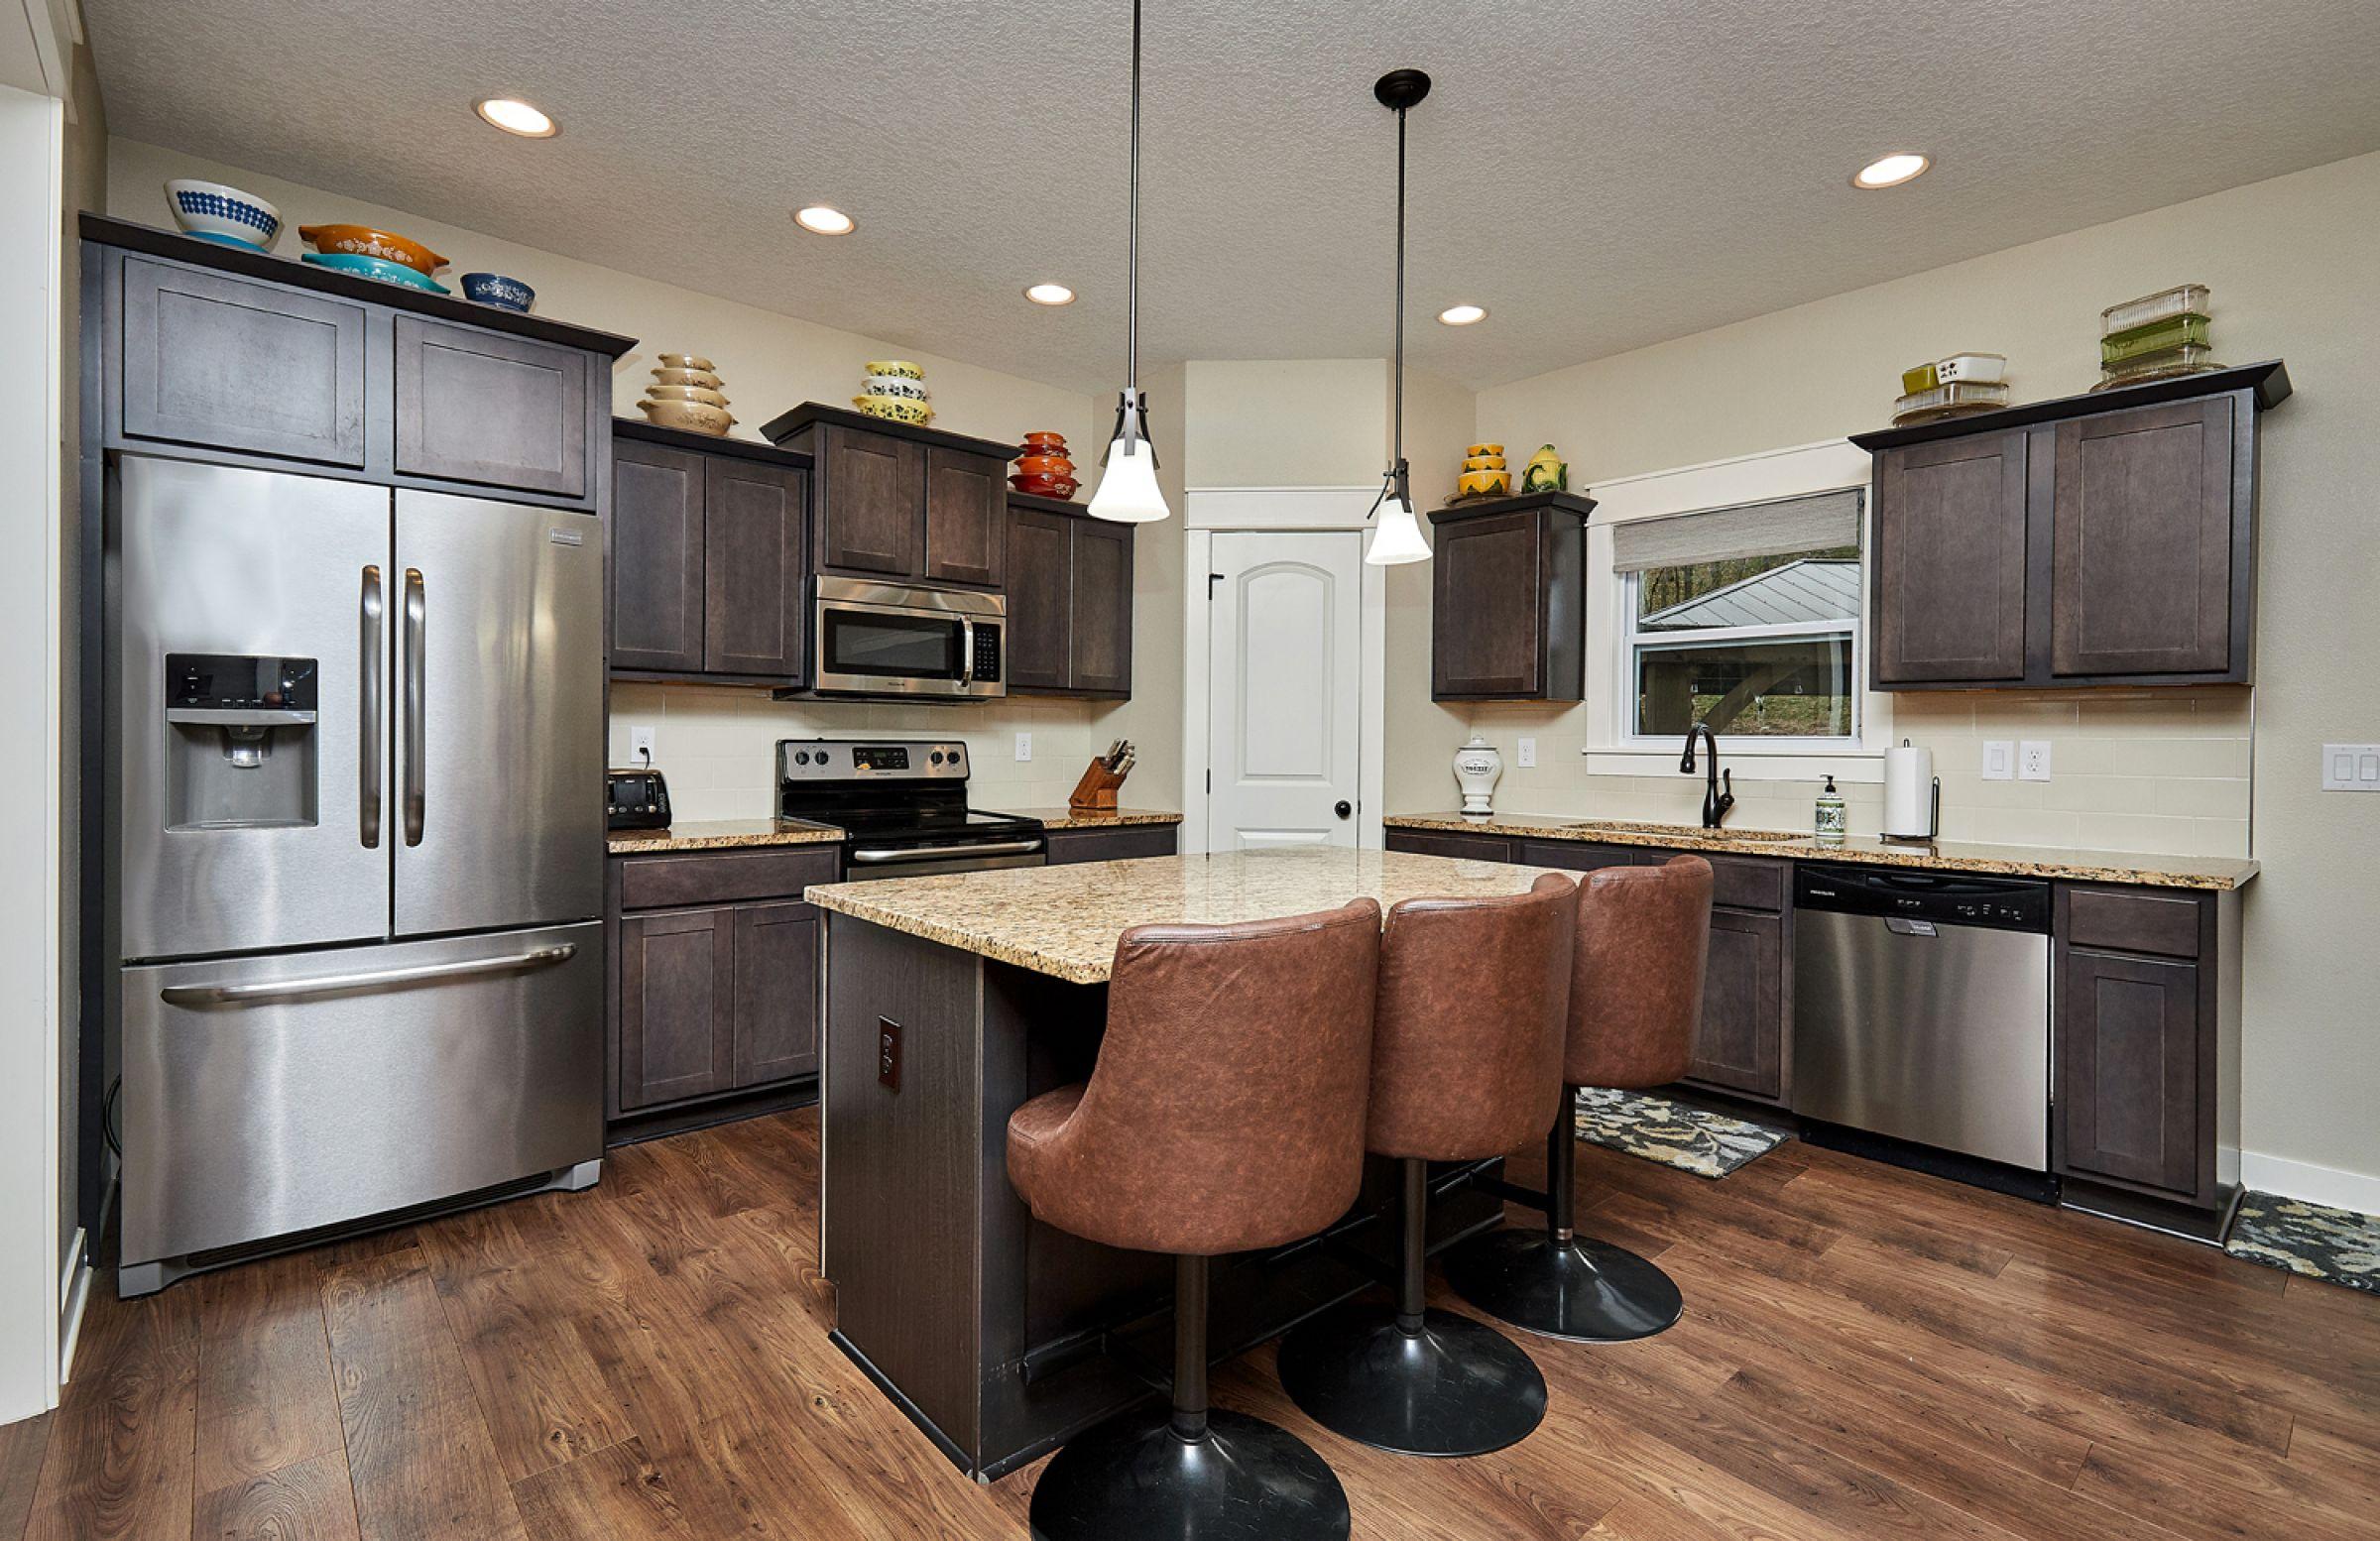 residential-warren-county-iowa-1-acres-listing-number-15254-14-2020-11-11-165825.jpg